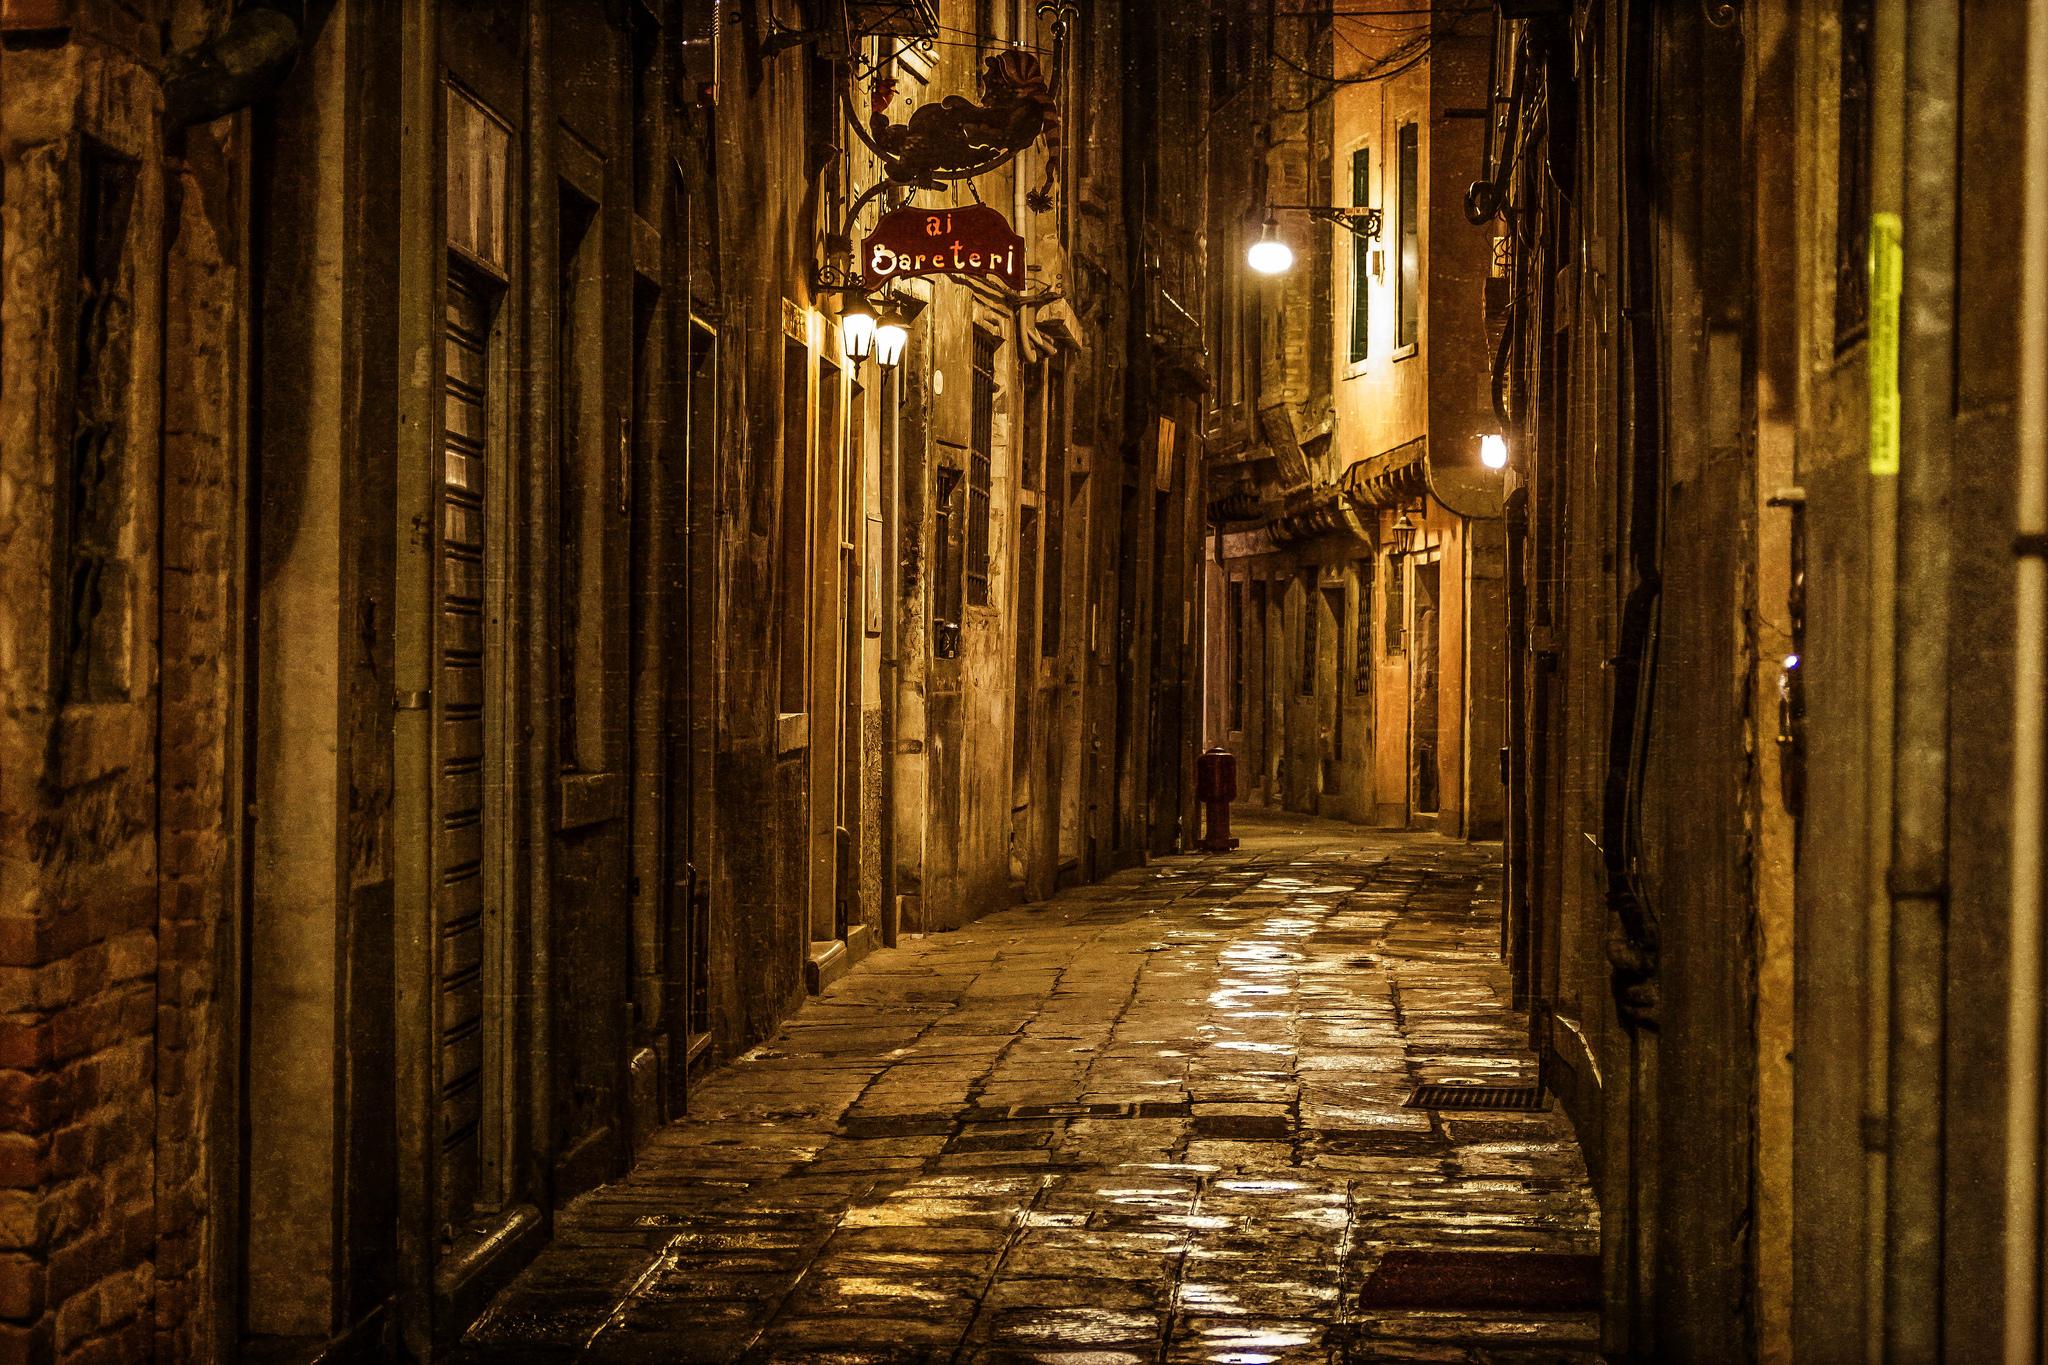 Франция дороги ночь фонари  № 2229349 бесплатно